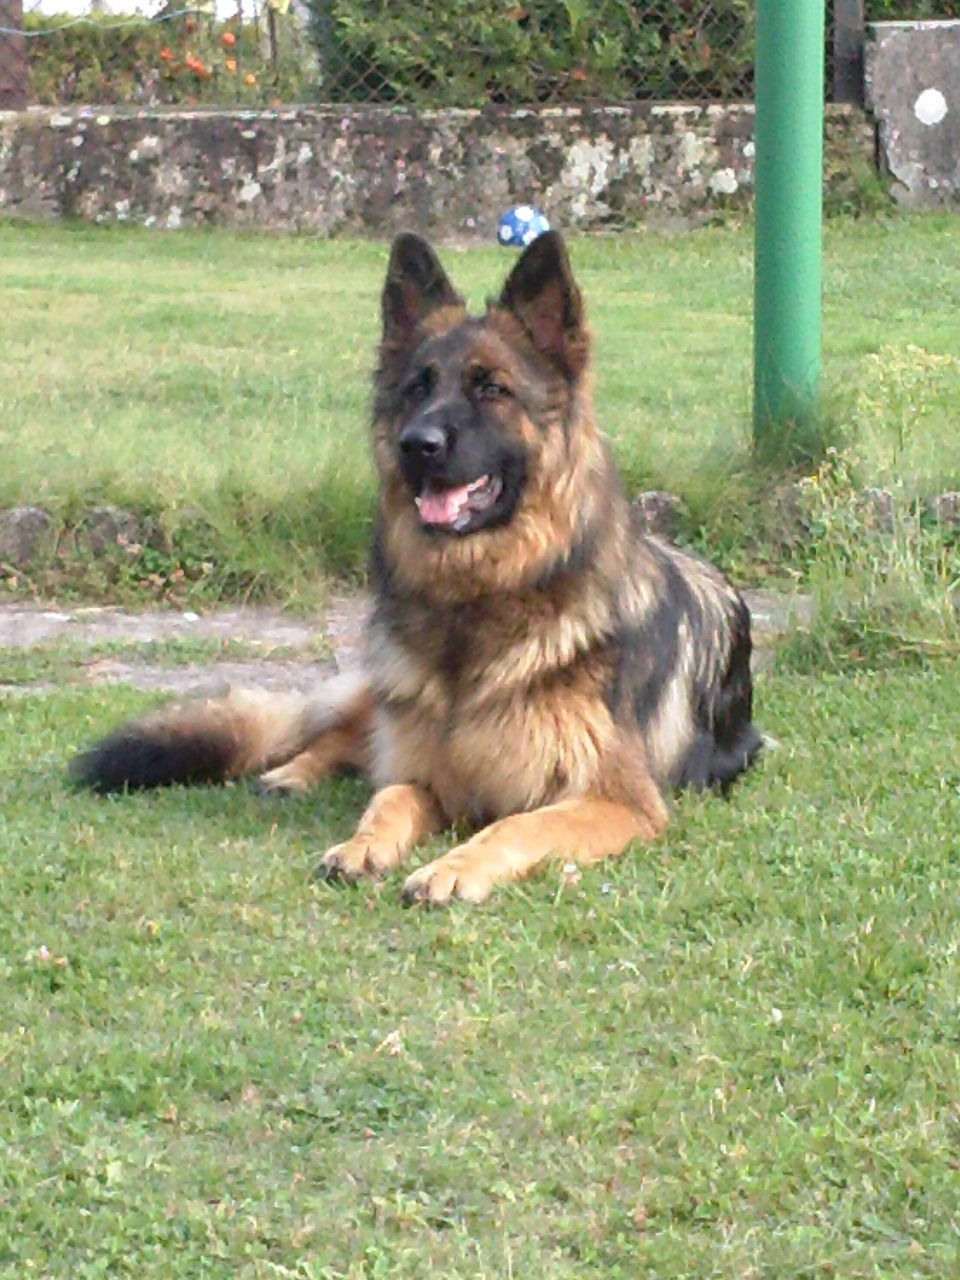 dog, grass, german shepherd, pets, one animal, domestic animals, outdoors, animal themes, day, mammal, no people, portrait, nature